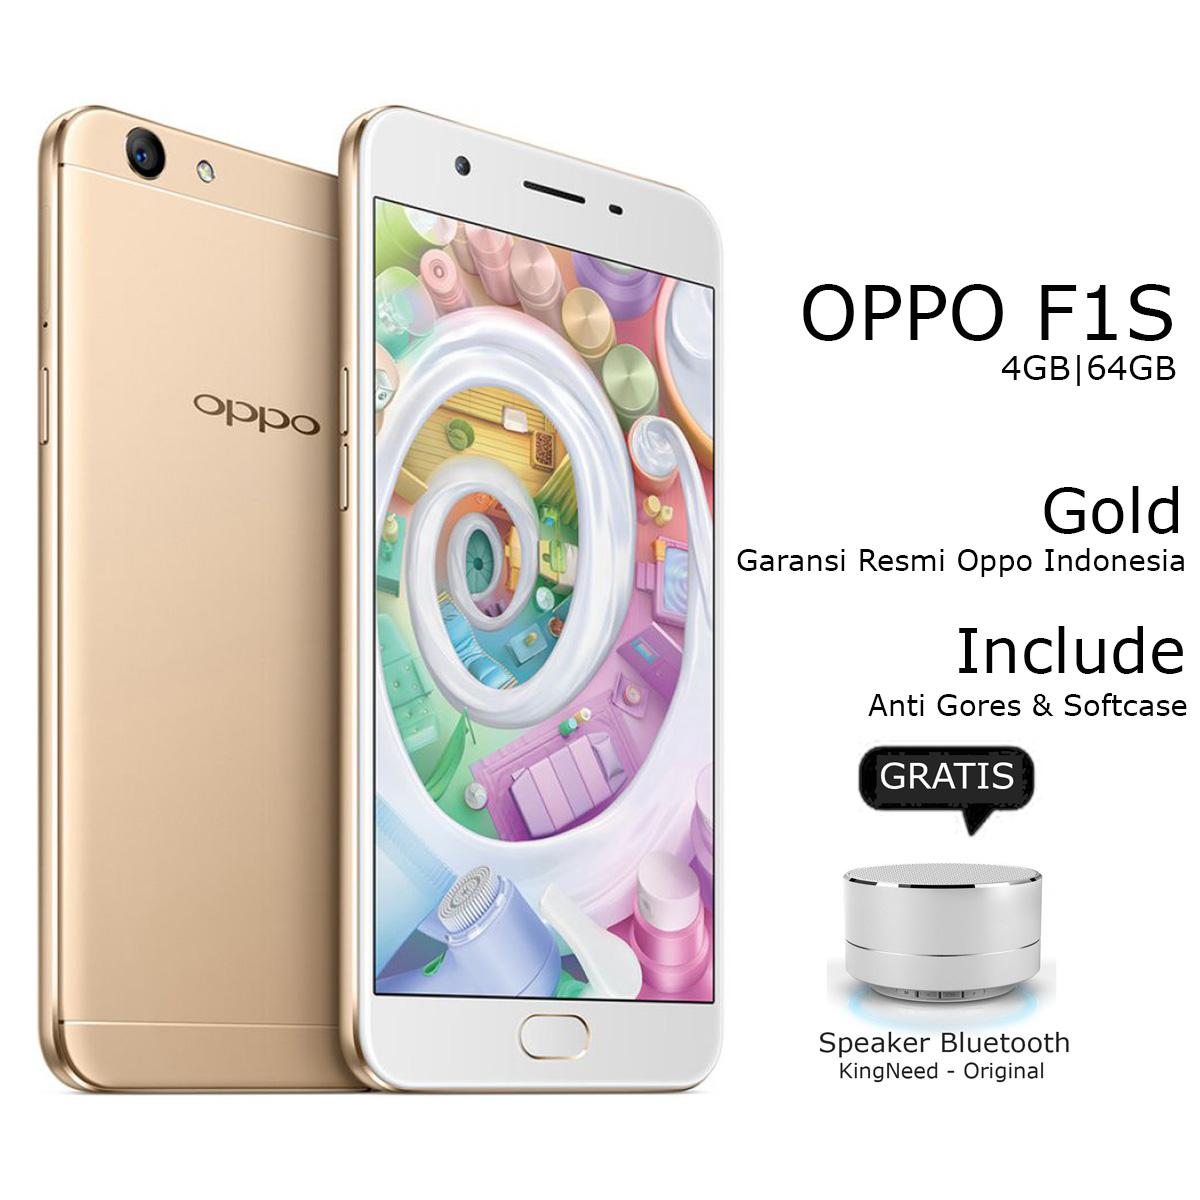 Oppo F1s Selfie Expert - New Edition - Ram 4GB - 64GB - Fingerprint - Jaringan 4G - Gold